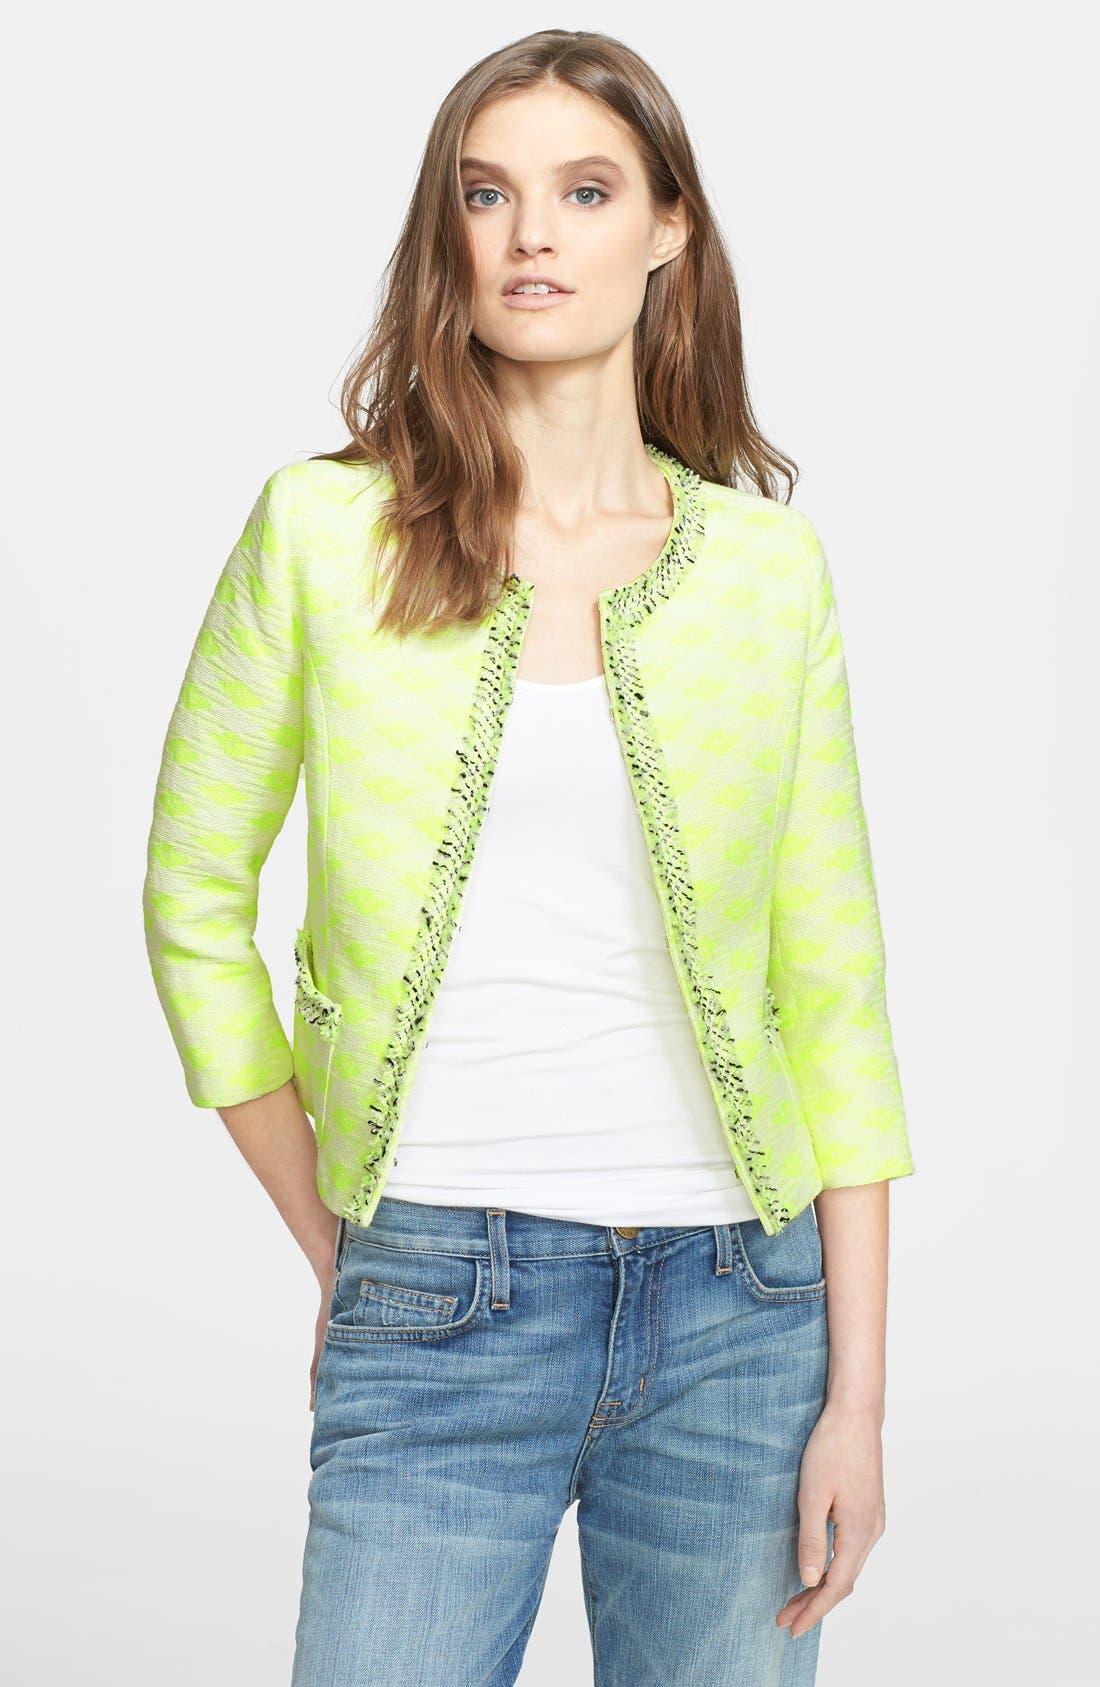 Alternate Image 1 Selected - Mcginn 'Jana' Diamond Woven Jacket